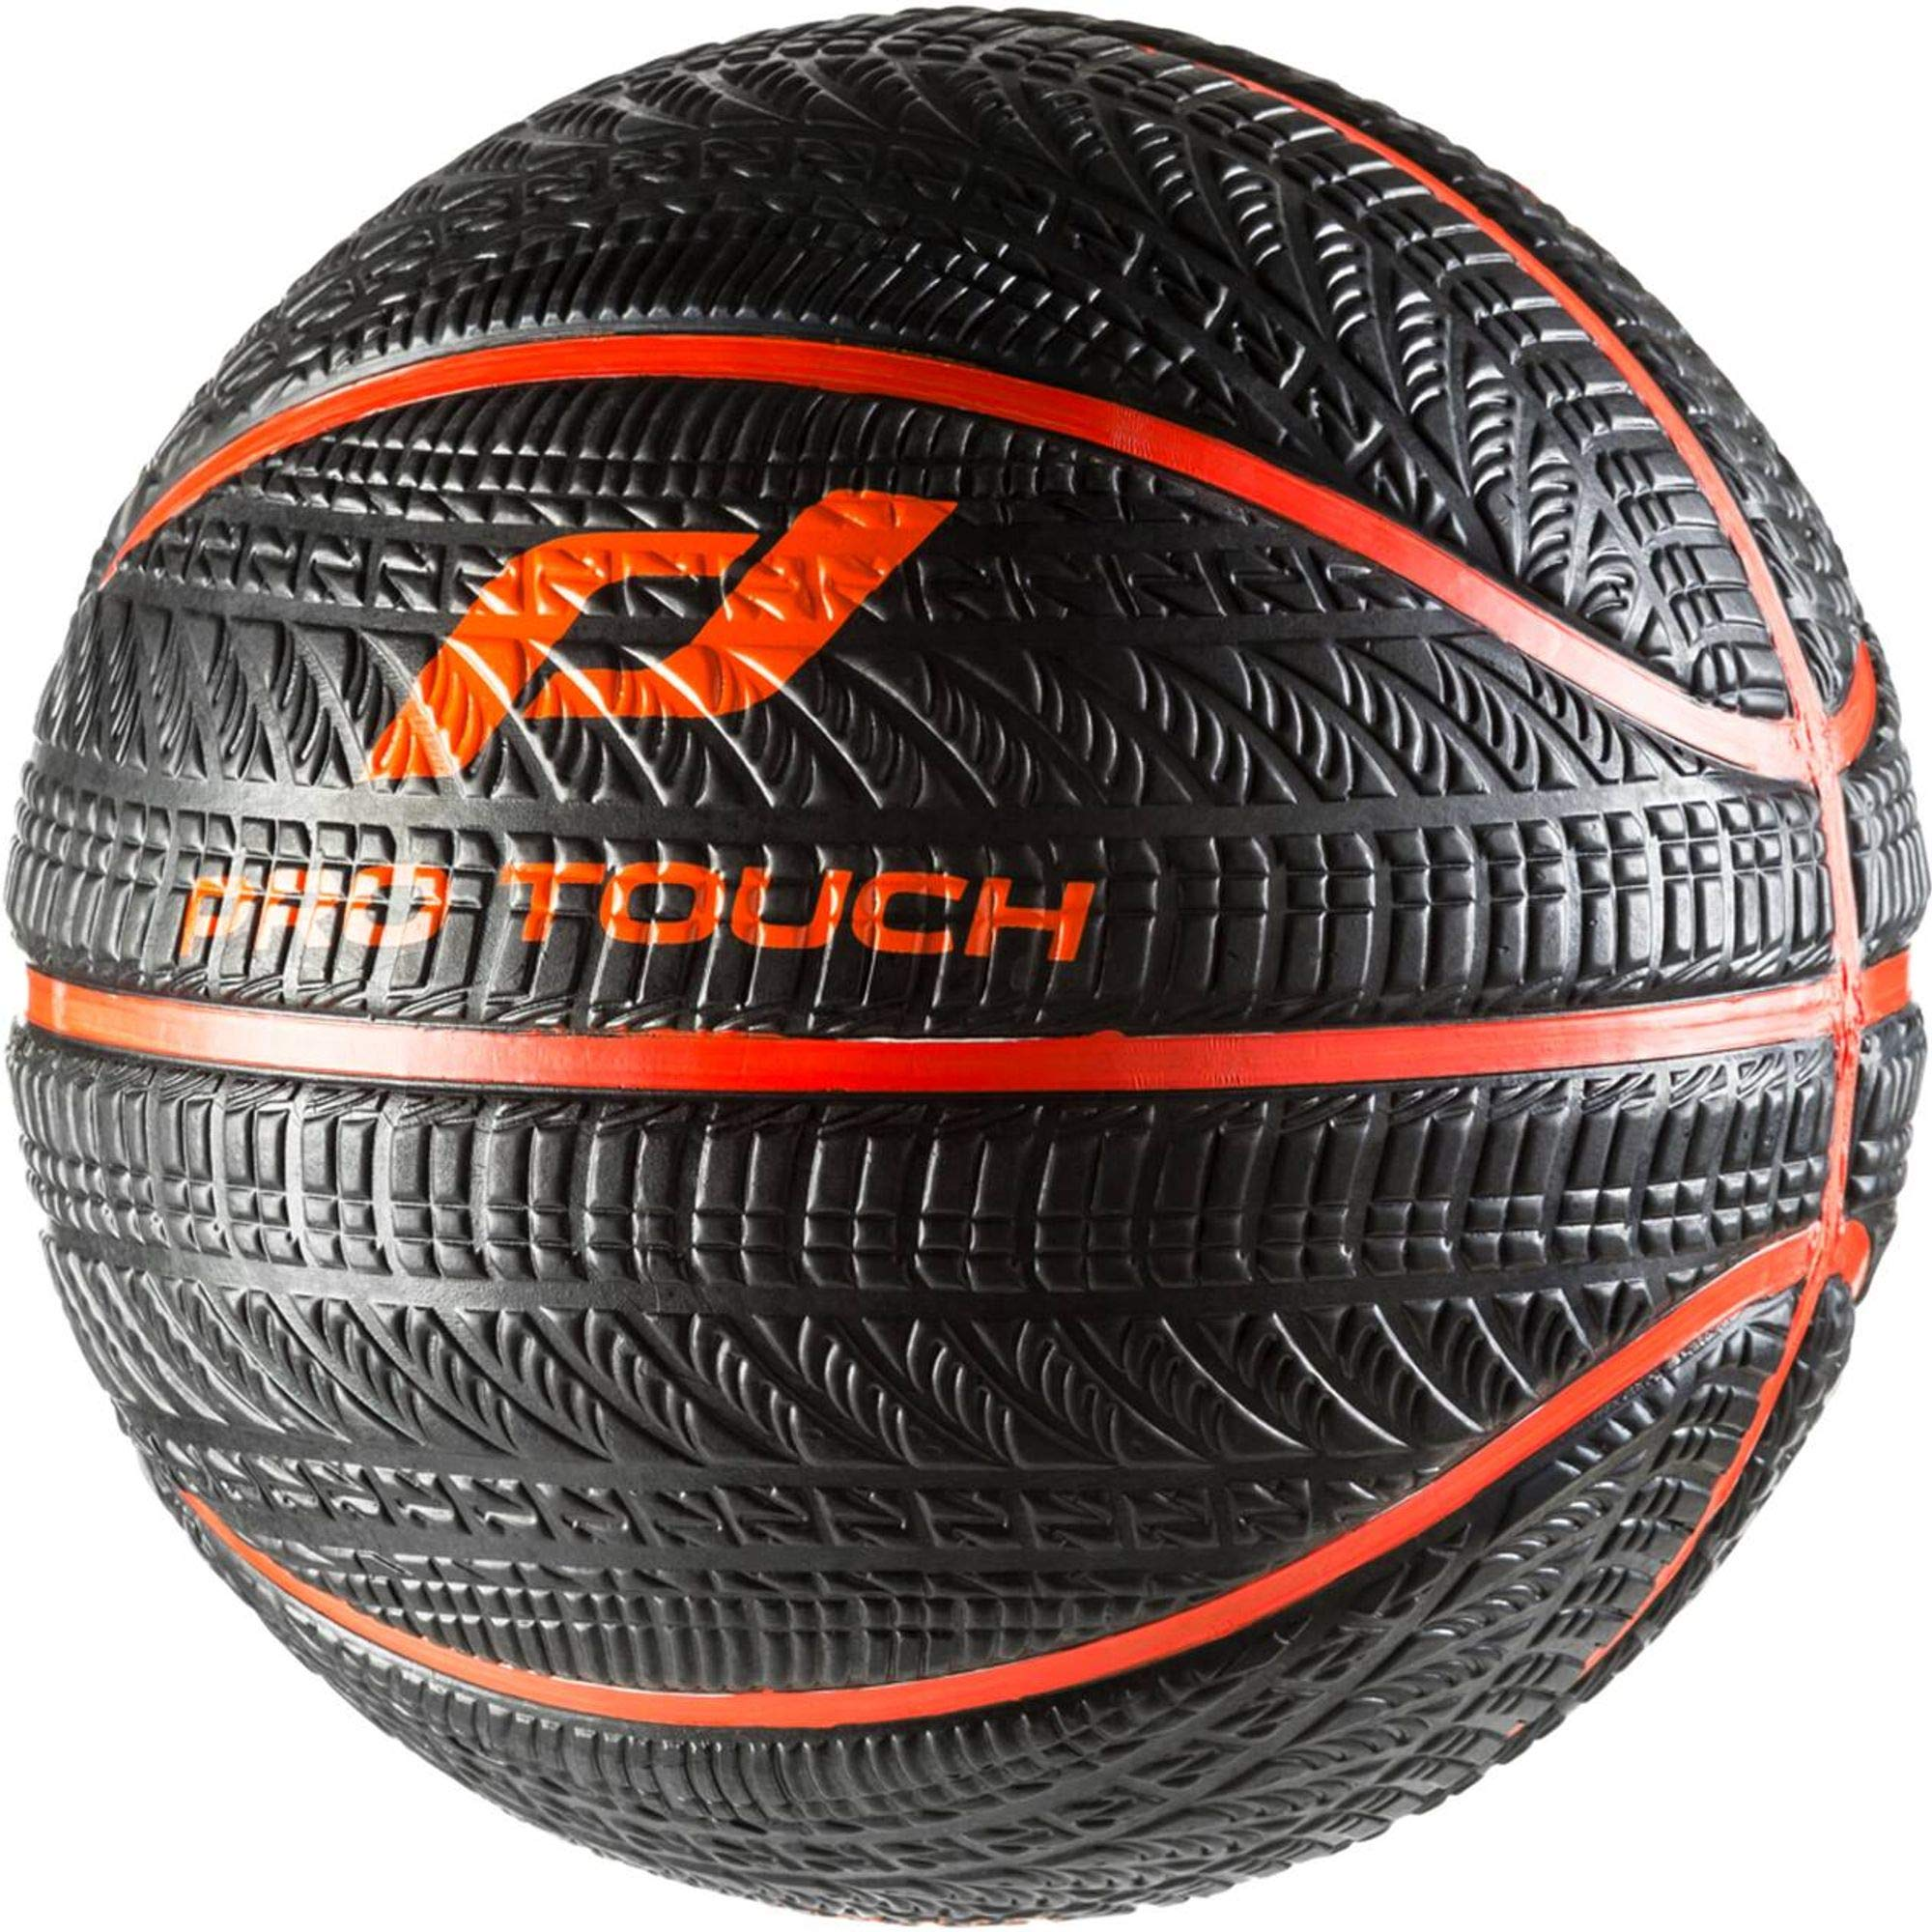 Pro Touch Baloncesto asfalt